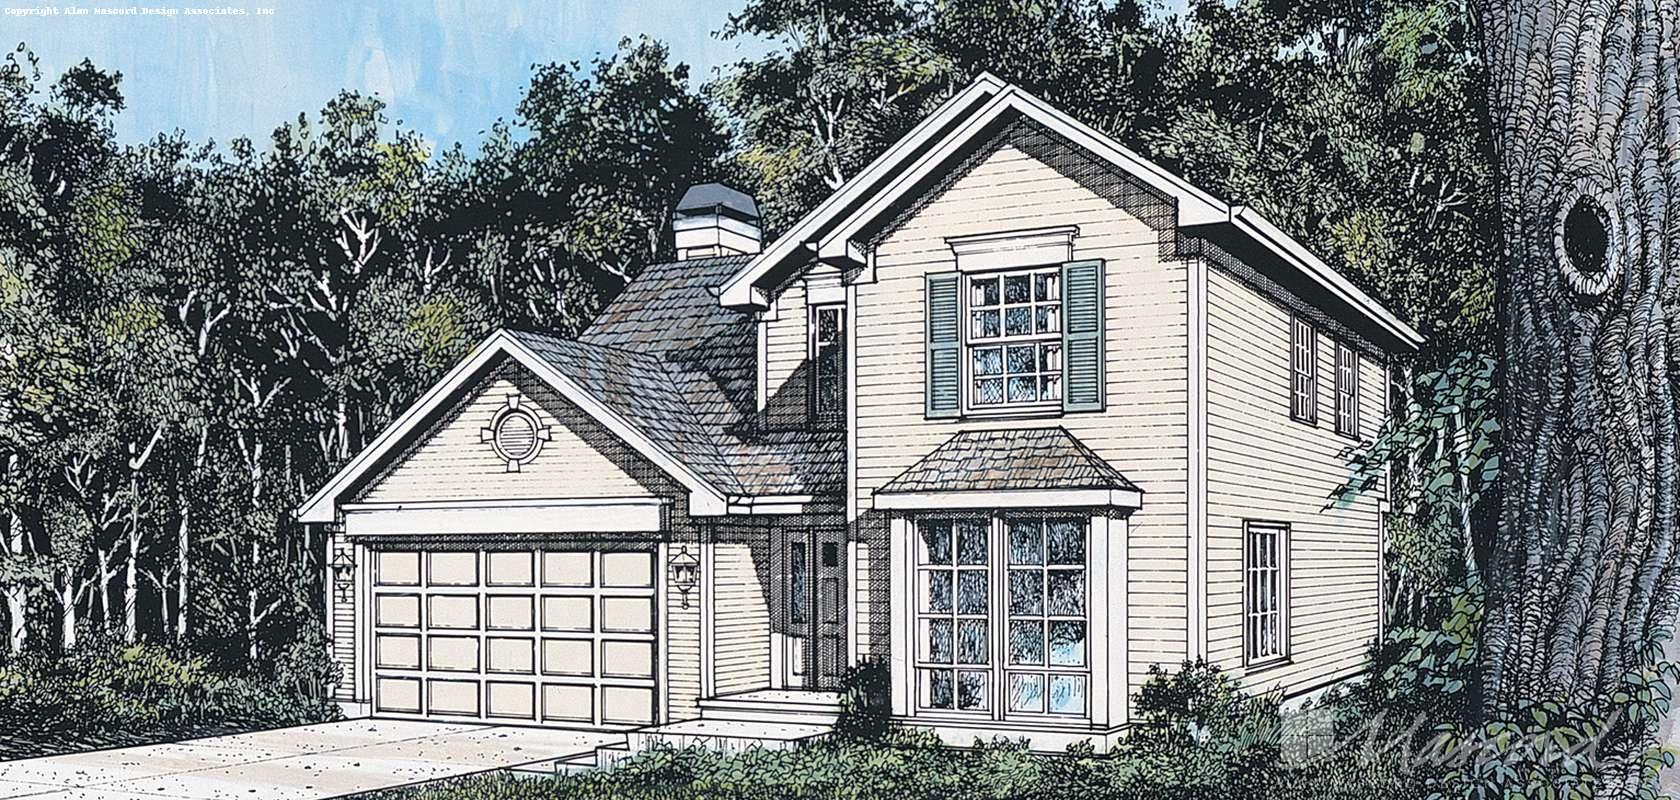 Mascord House Plan 2152: The Charleston